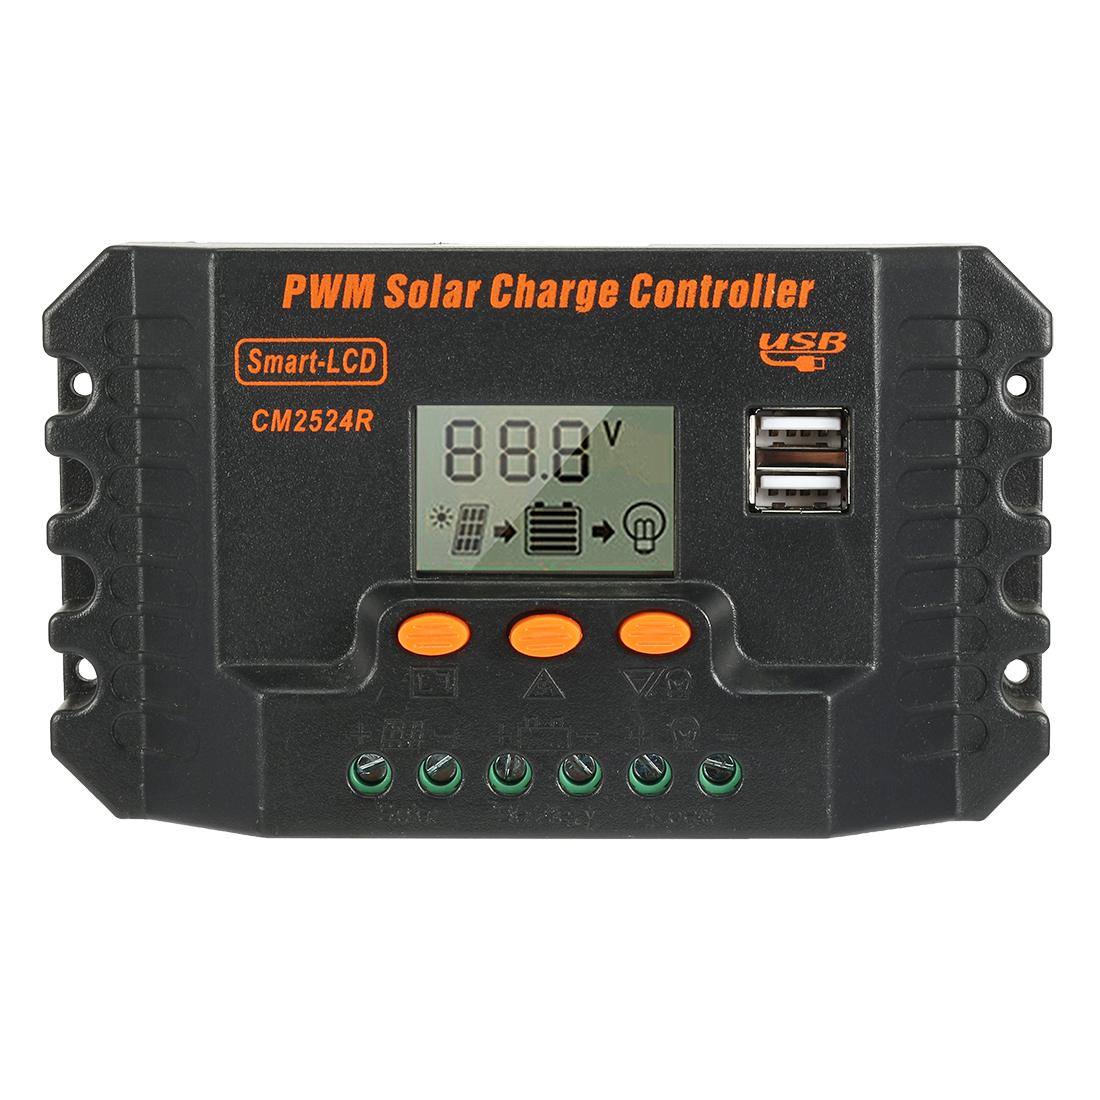 Intelligent 25A PWM Solar Panel Charge Controller 12V-24V Battery Regulator CM2524R